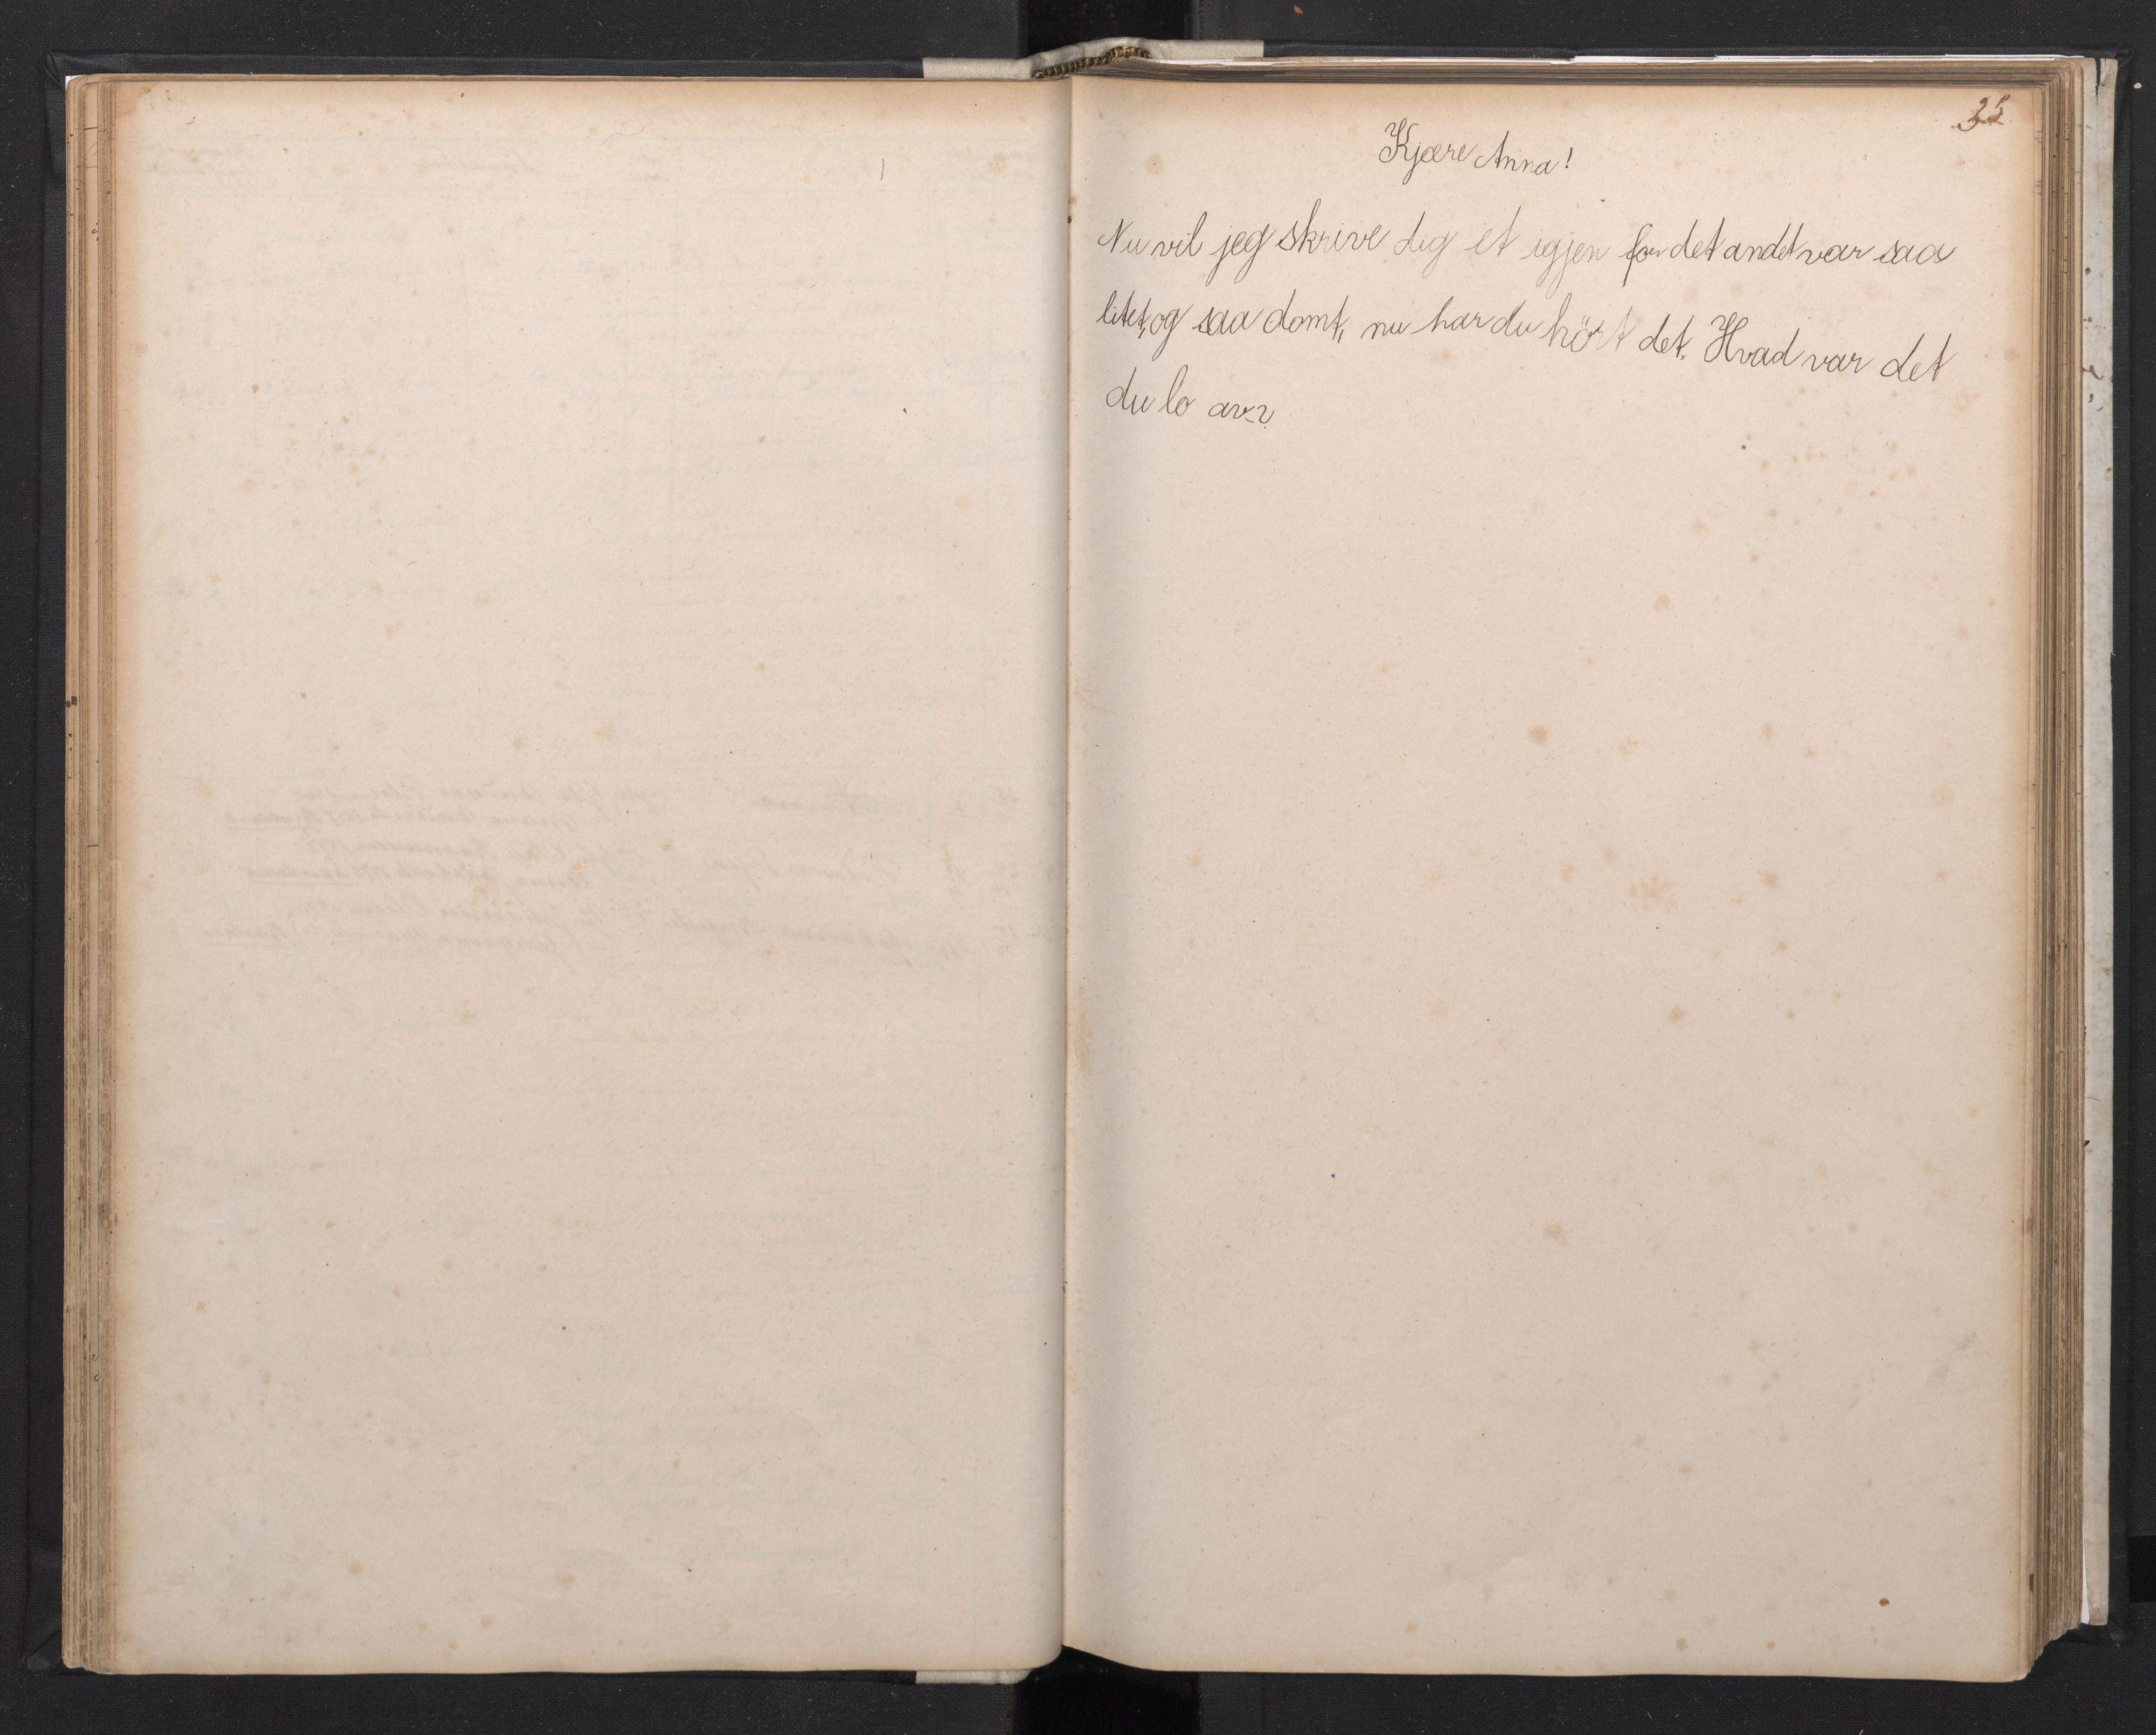 SAB, Manger sokneprestembete, H/Hab: Klokkerbok nr. A 1, 1874-1901, s. 34b-35a